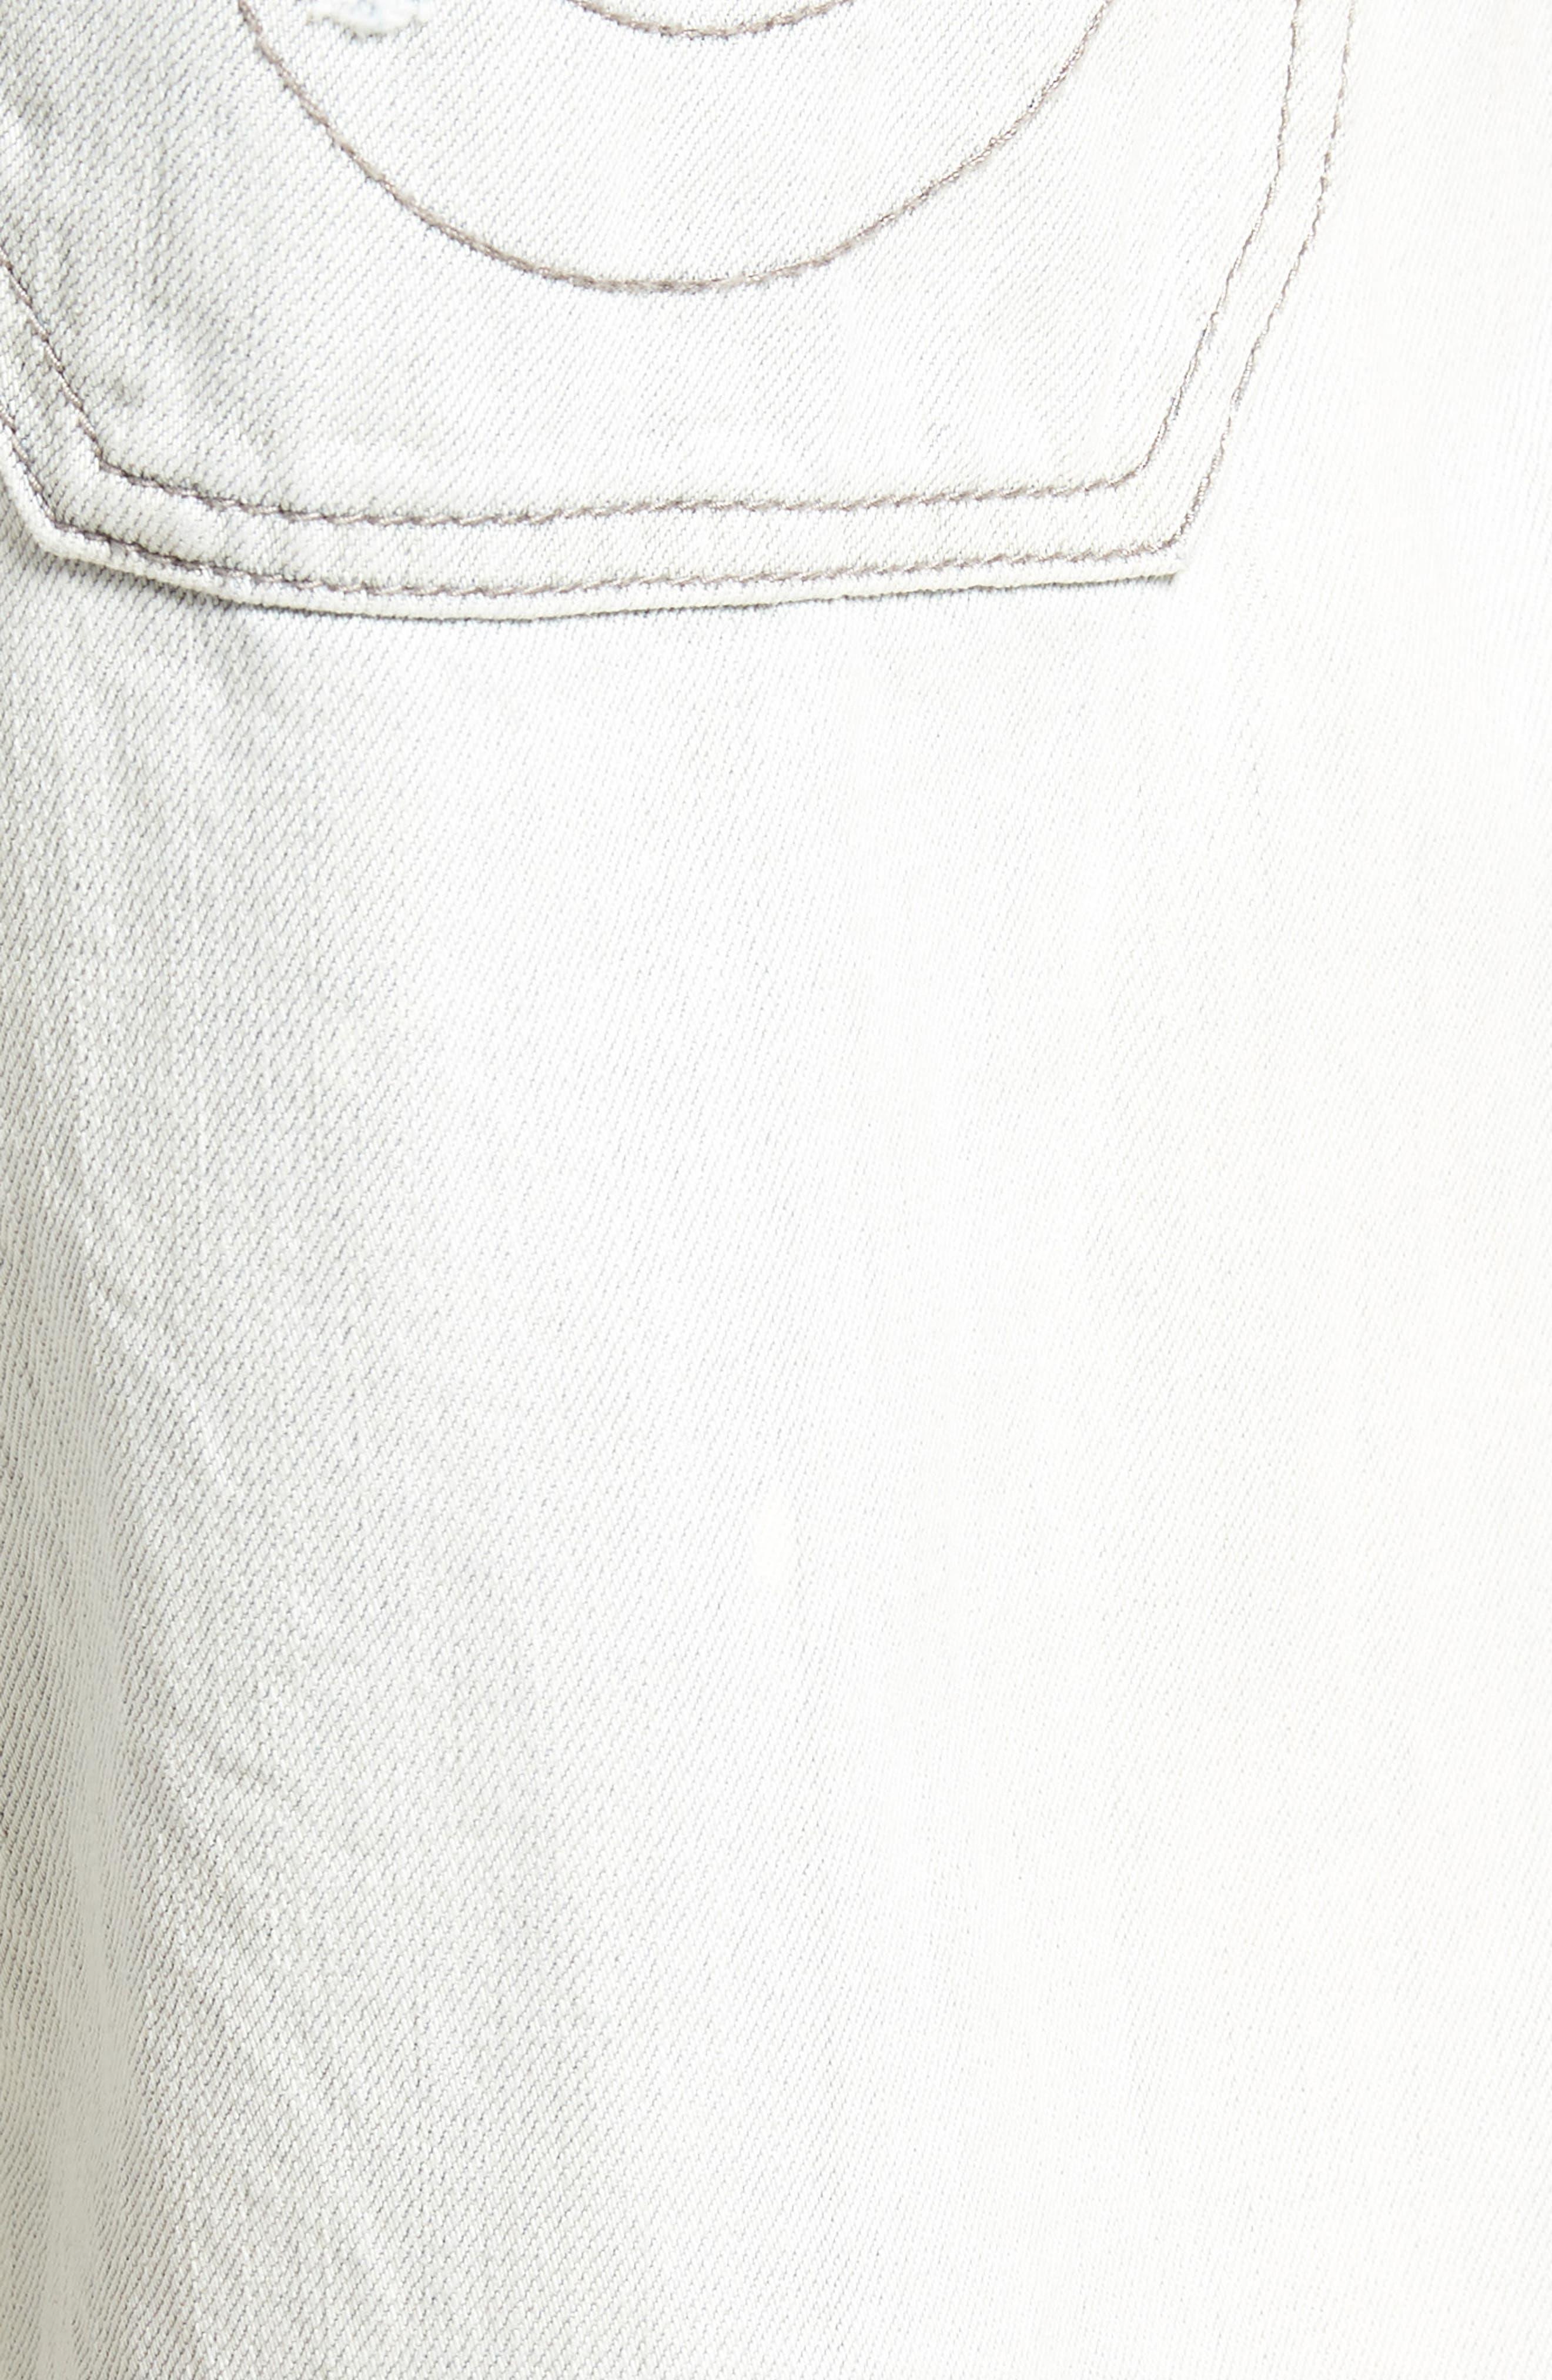 Field Shorts,                             Alternate thumbnail 5, color,                             Upstate